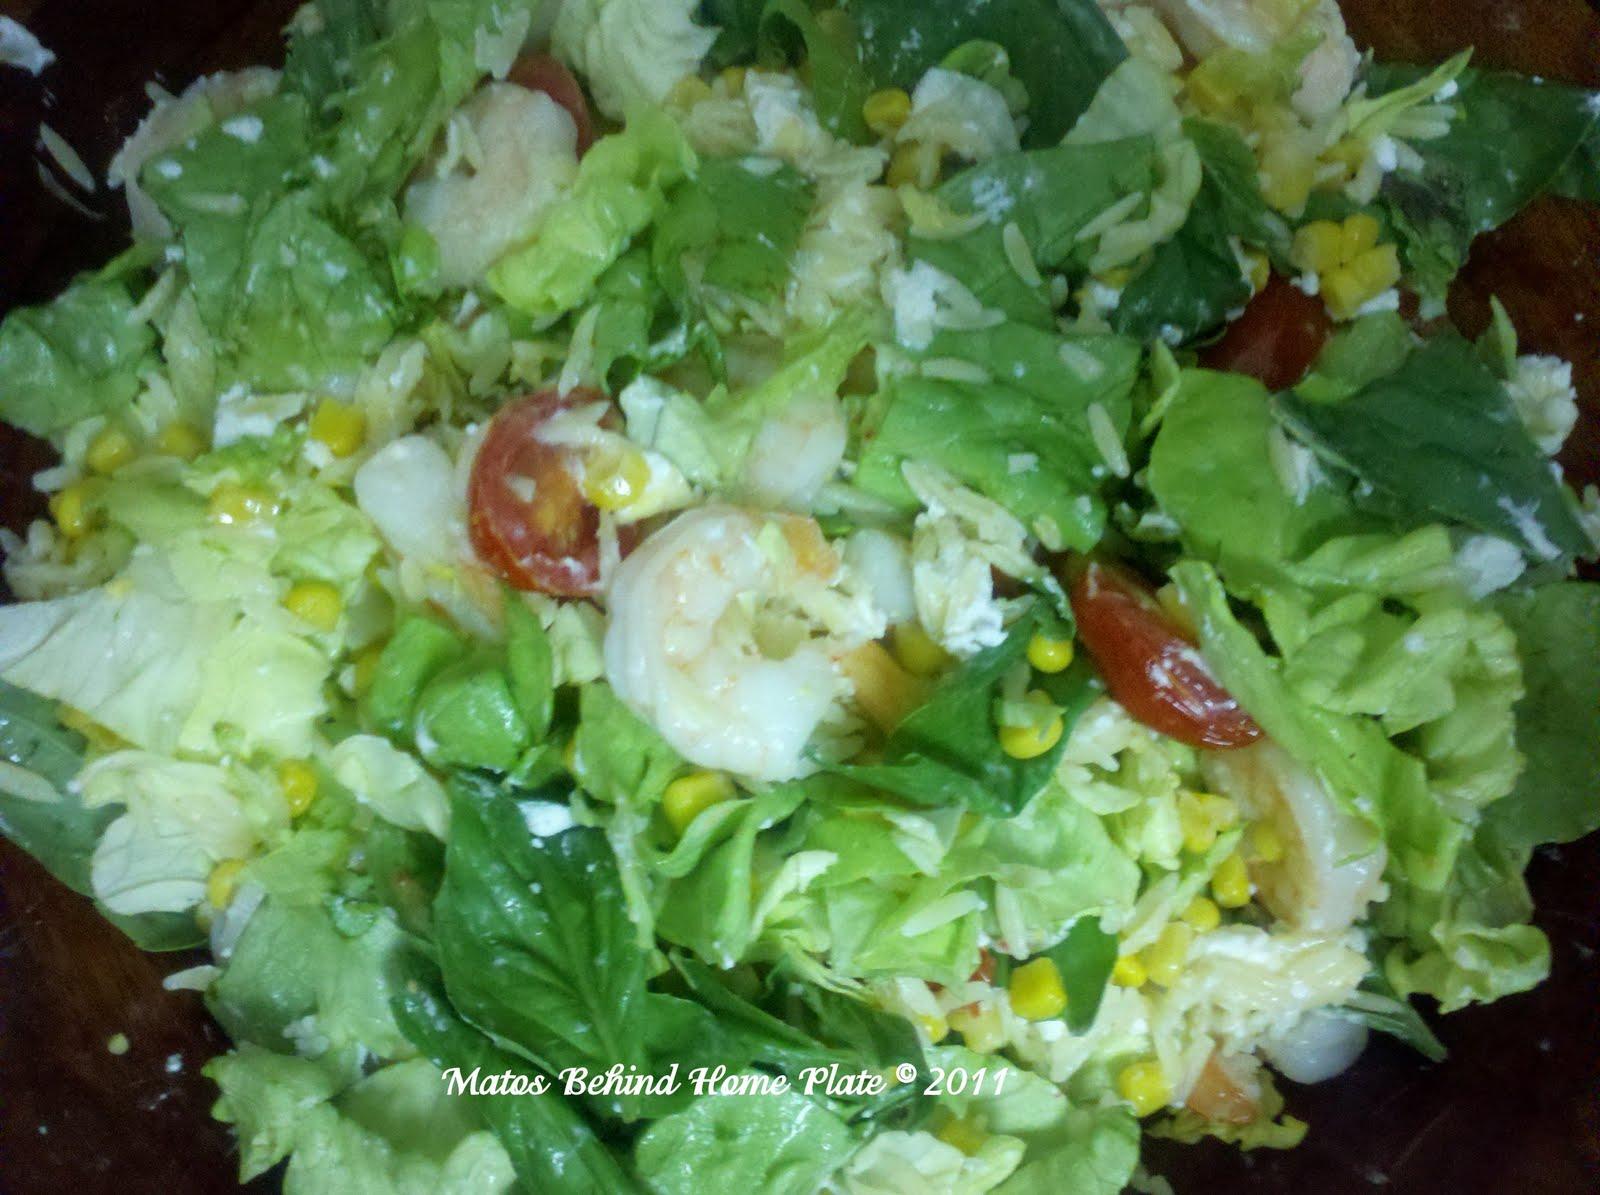 Matos Behind Home Plate: Shrimp, Corn and Goat-Cheese Pasta Salad